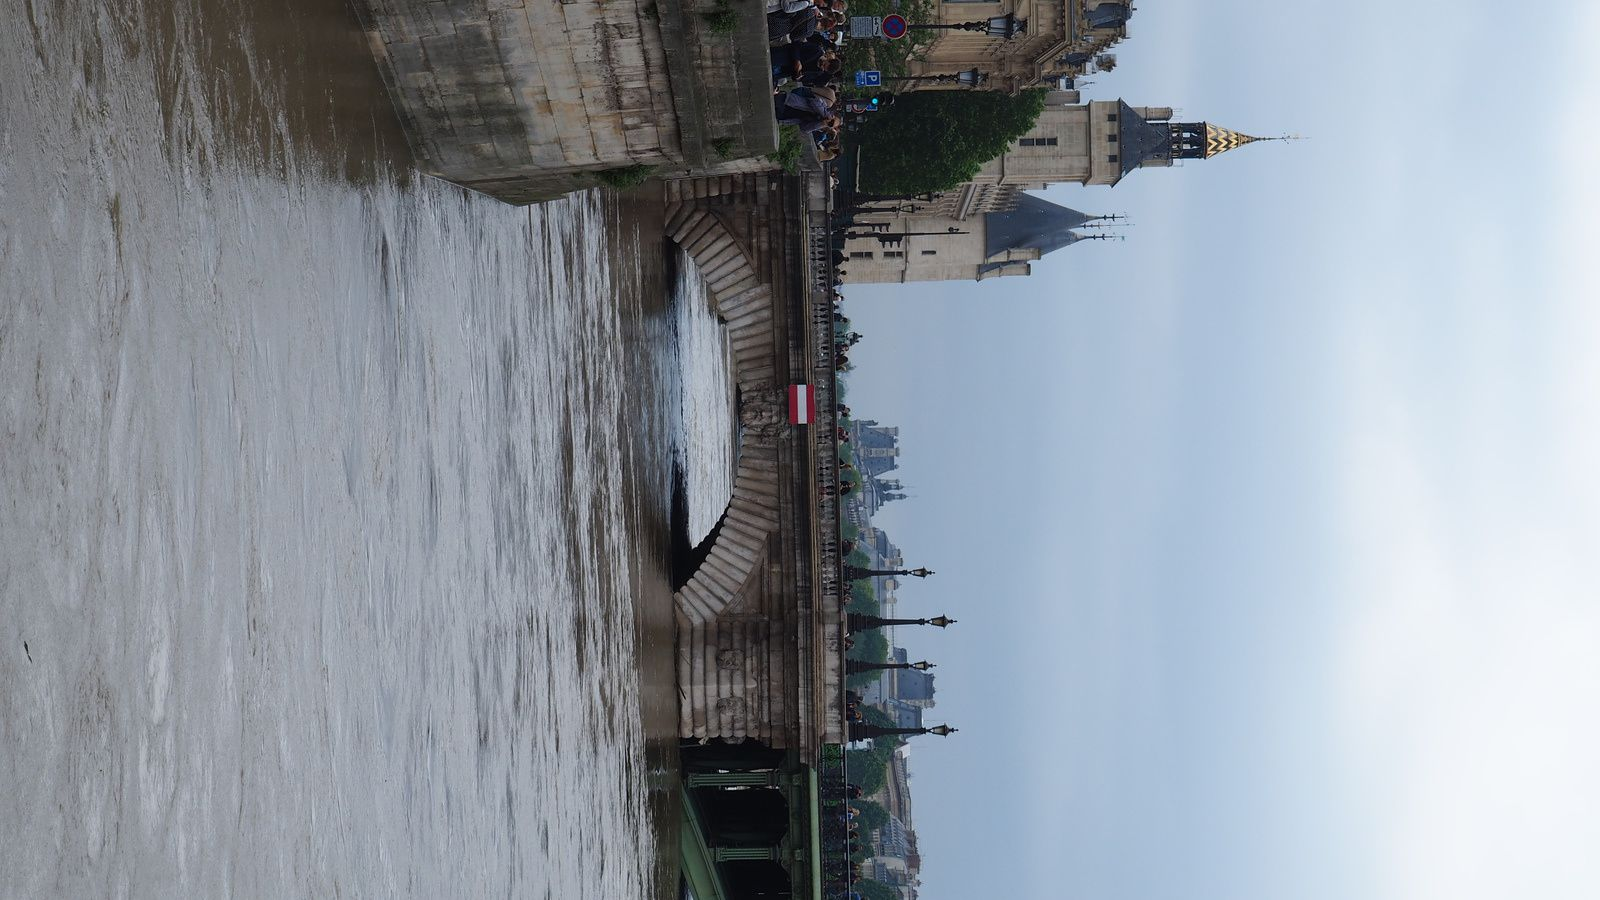 Paris, Crue du 6 juin 2016